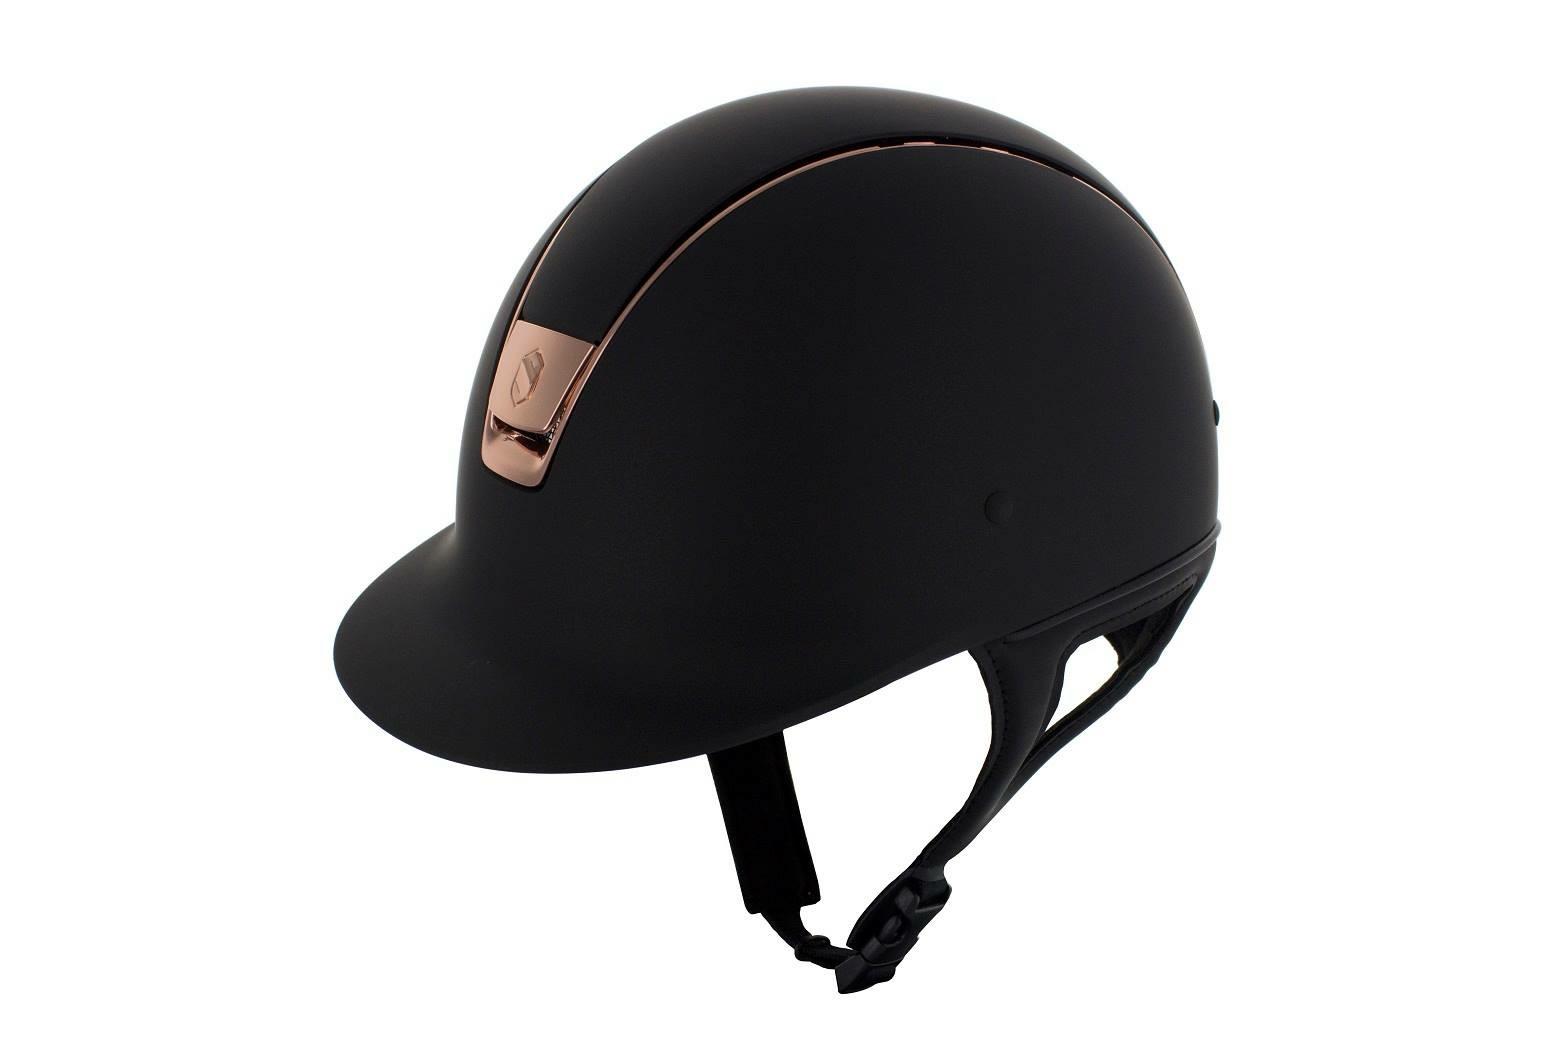 Samshield Shadowmatt Helmet Royal Equestrian